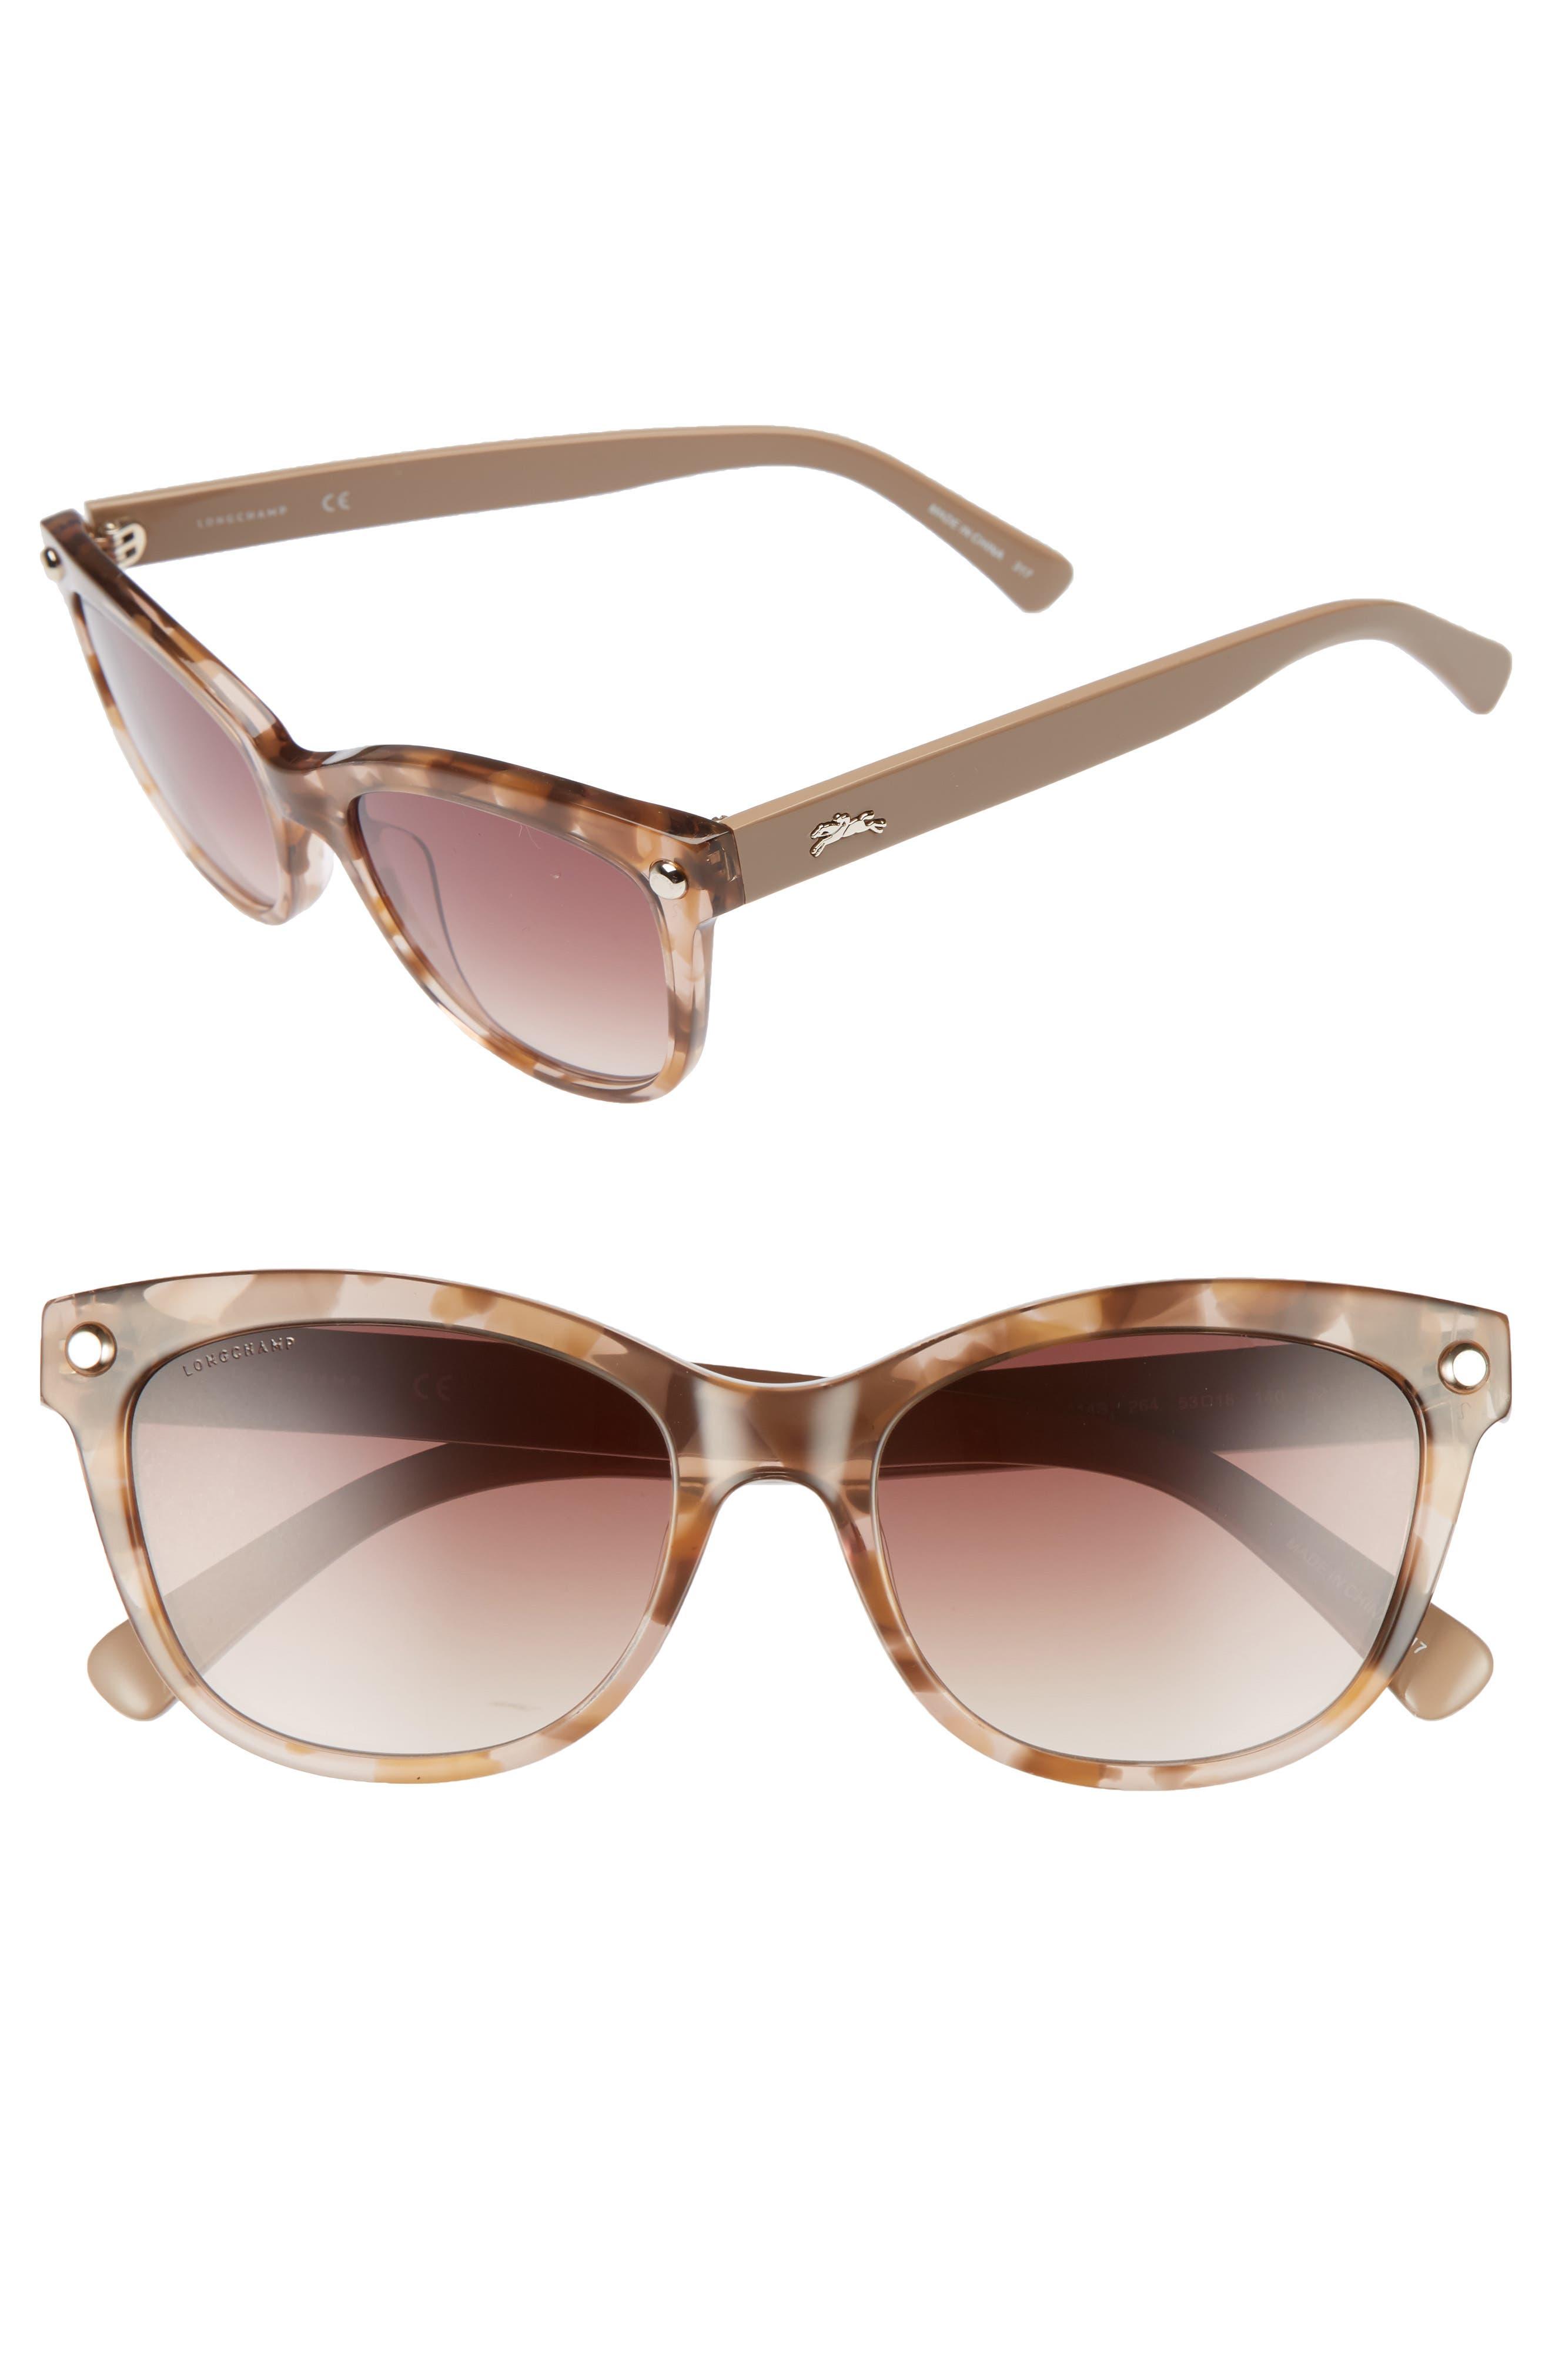 53mm Gradient Lens Cat Eye Sunglasses,                             Main thumbnail 1, color,                             MARBLE BEIGE